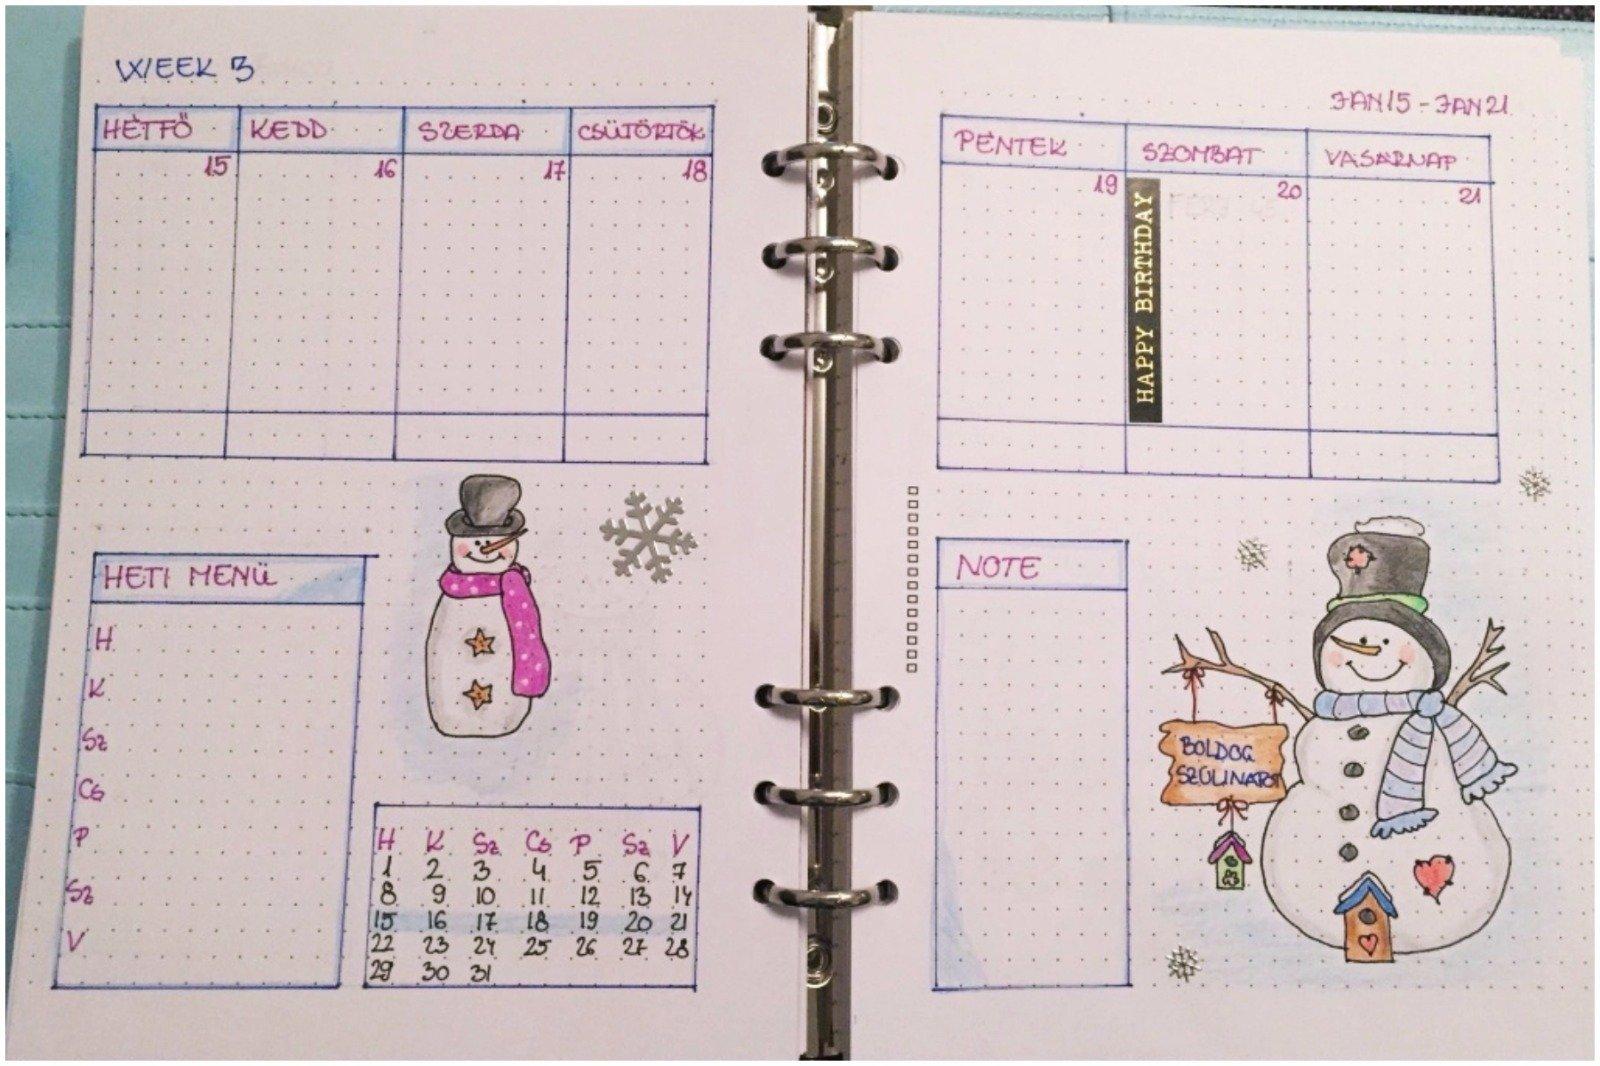 Creative journal weekly planner - week 3 - itstartswithacoffee.com #creativejournaling #weekly #weeklyplanner #2018 #january #2018January #planner